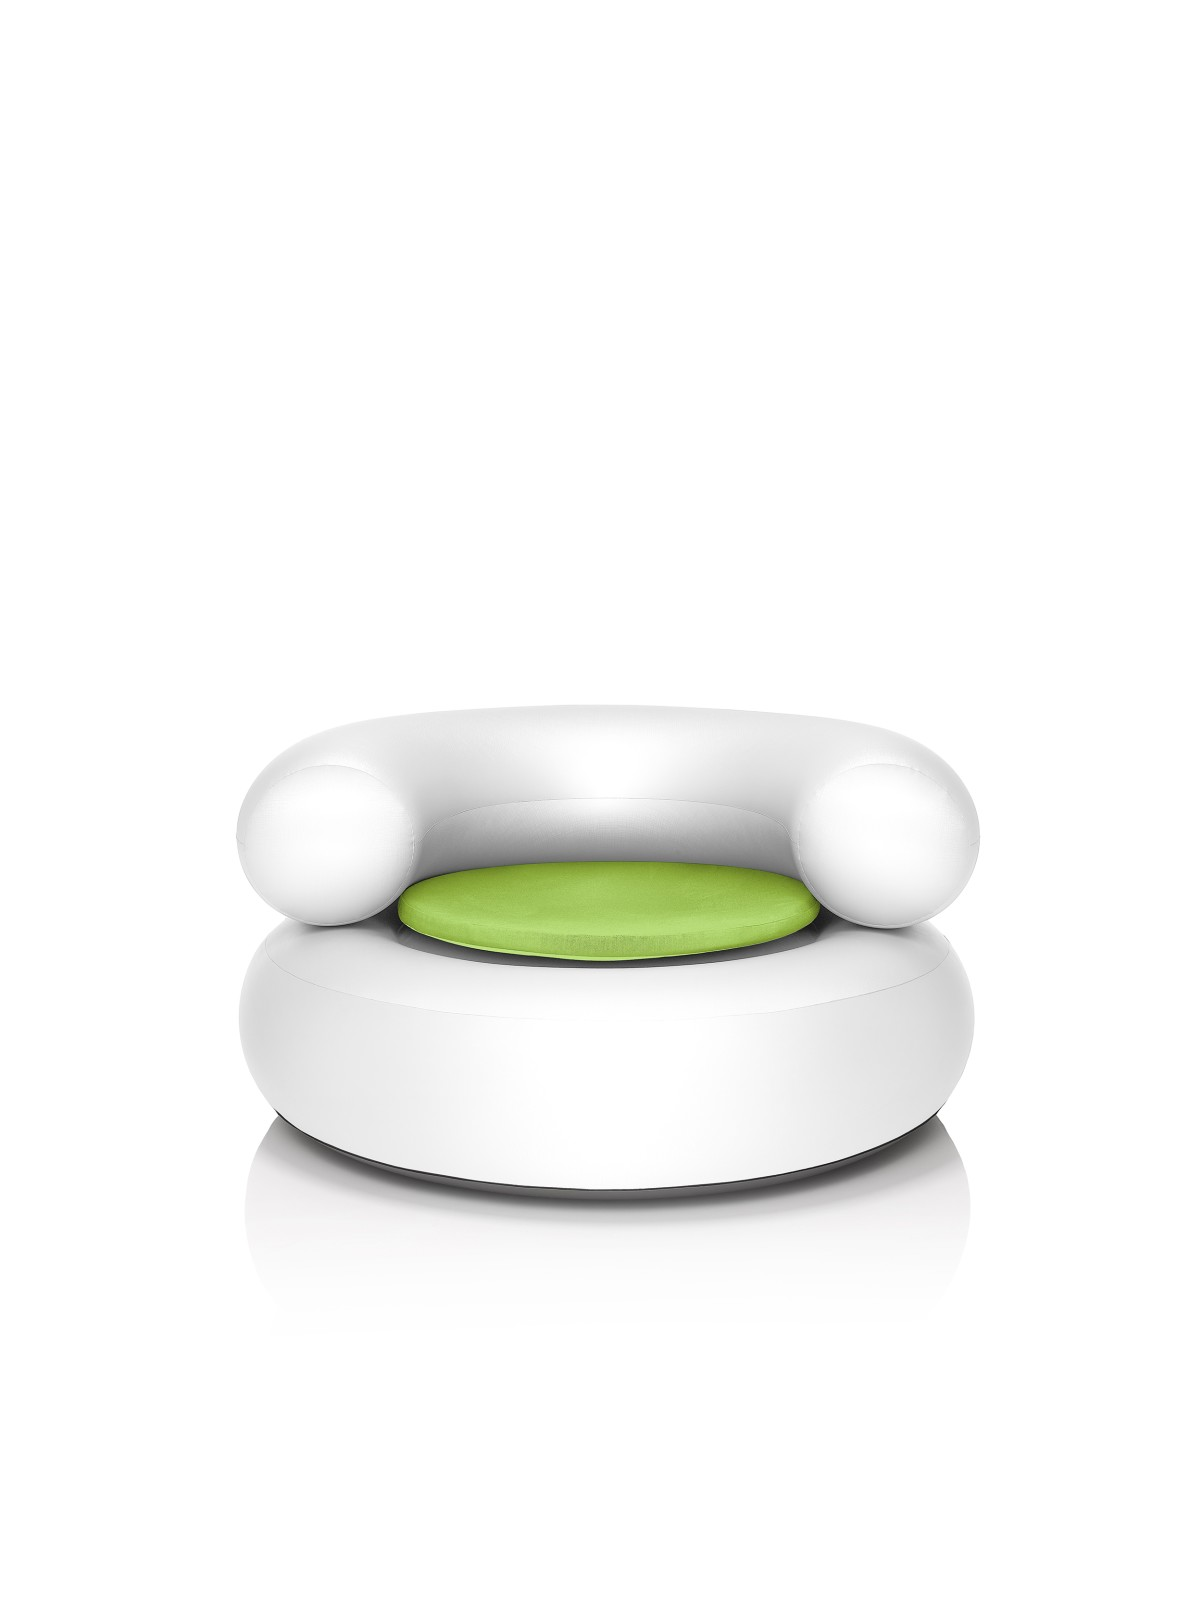 CH-AIR Armchair White with Green Pillow